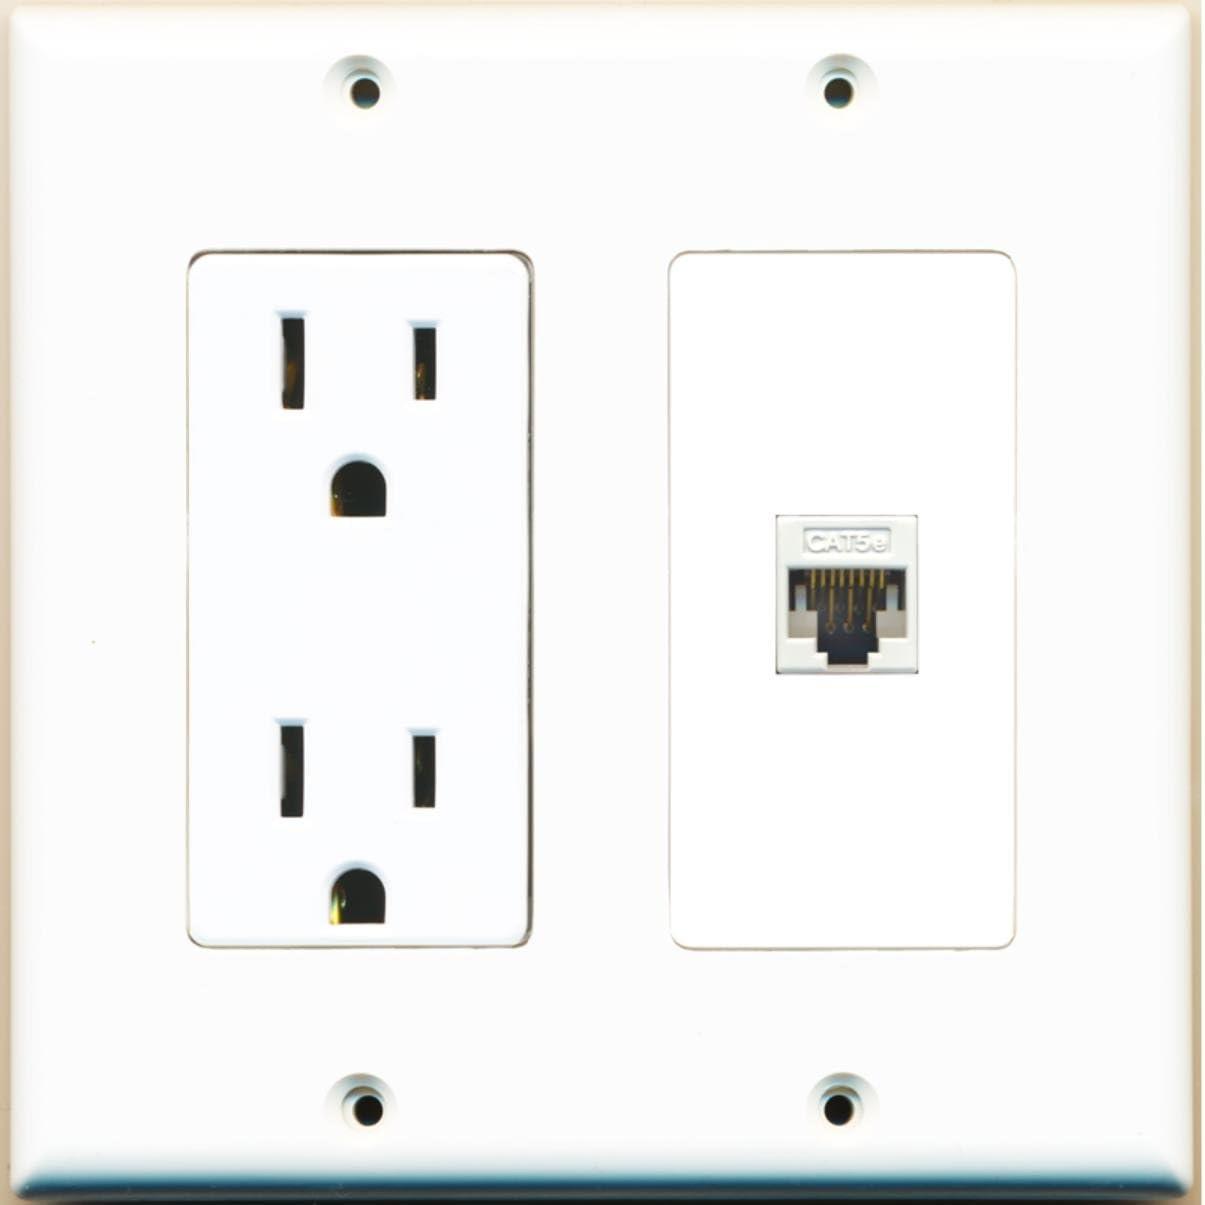 RiteAV - 15 Super intense SALE Max 85% OFF Amp Power Outlet Port Ethernet Decorativ 1 Cat5e and